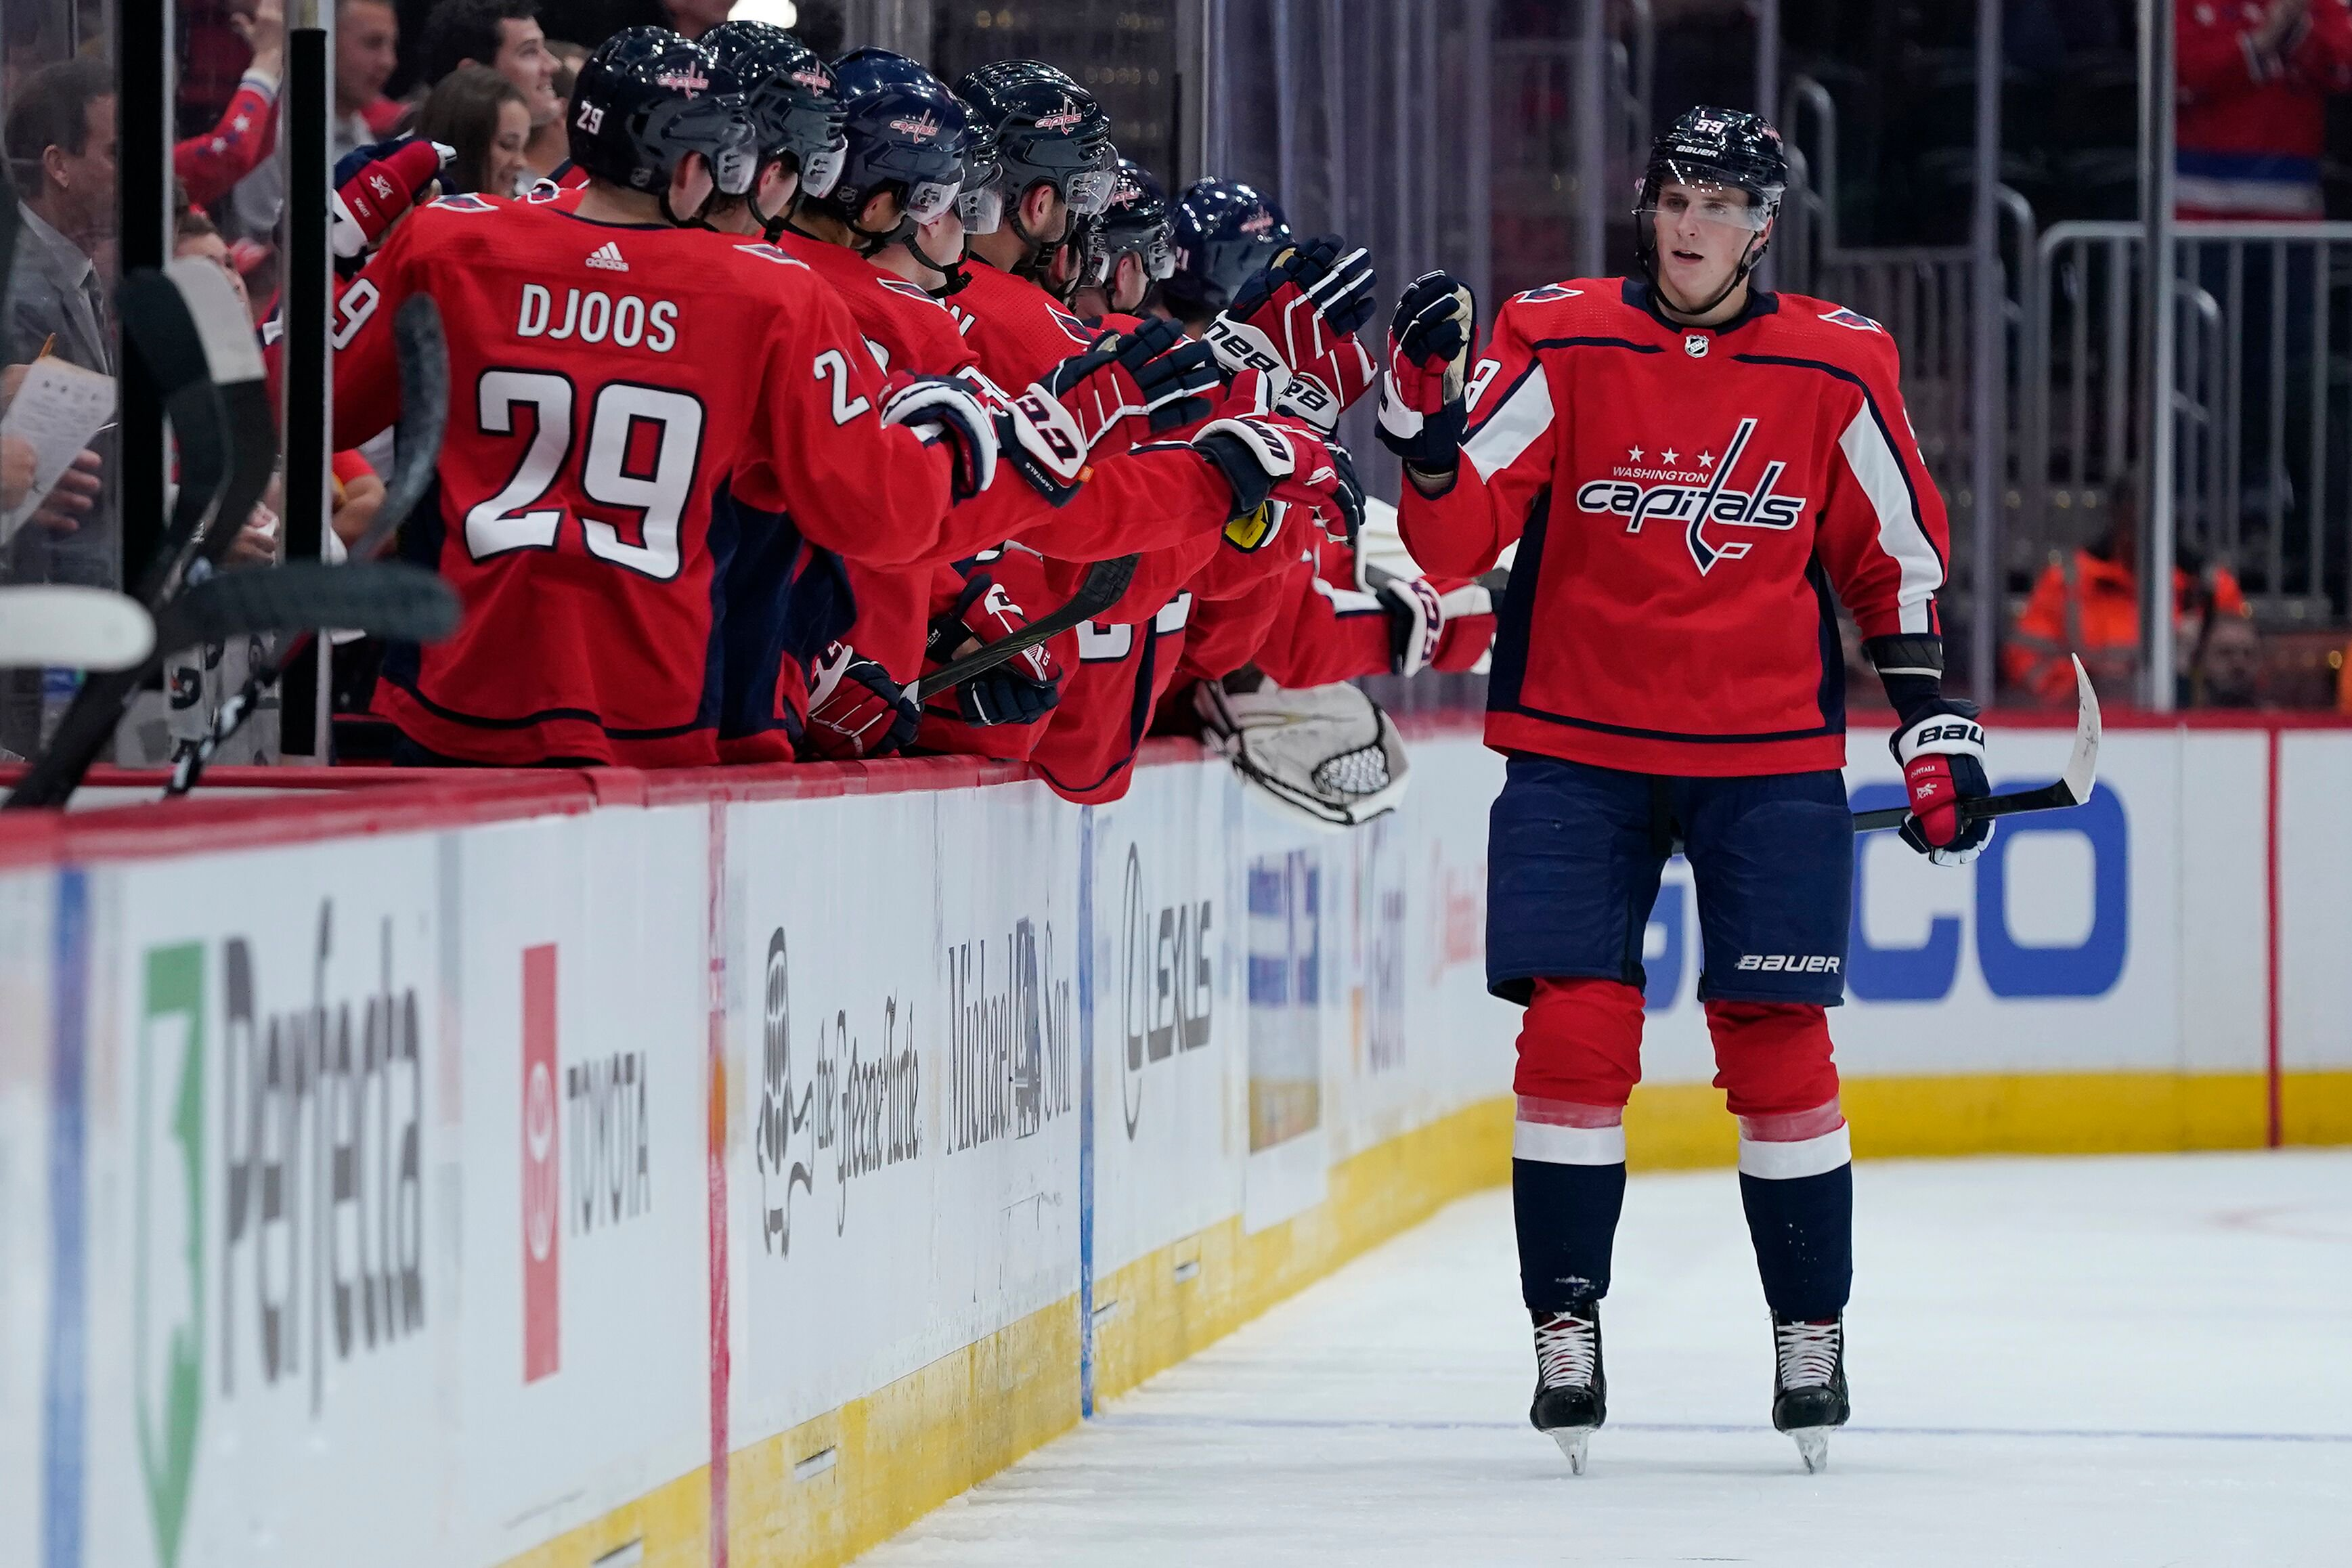 http://hockey.by/upload/iblock/6aa/6aaf7ec1645b685df382f72eb81b00b0.jpg